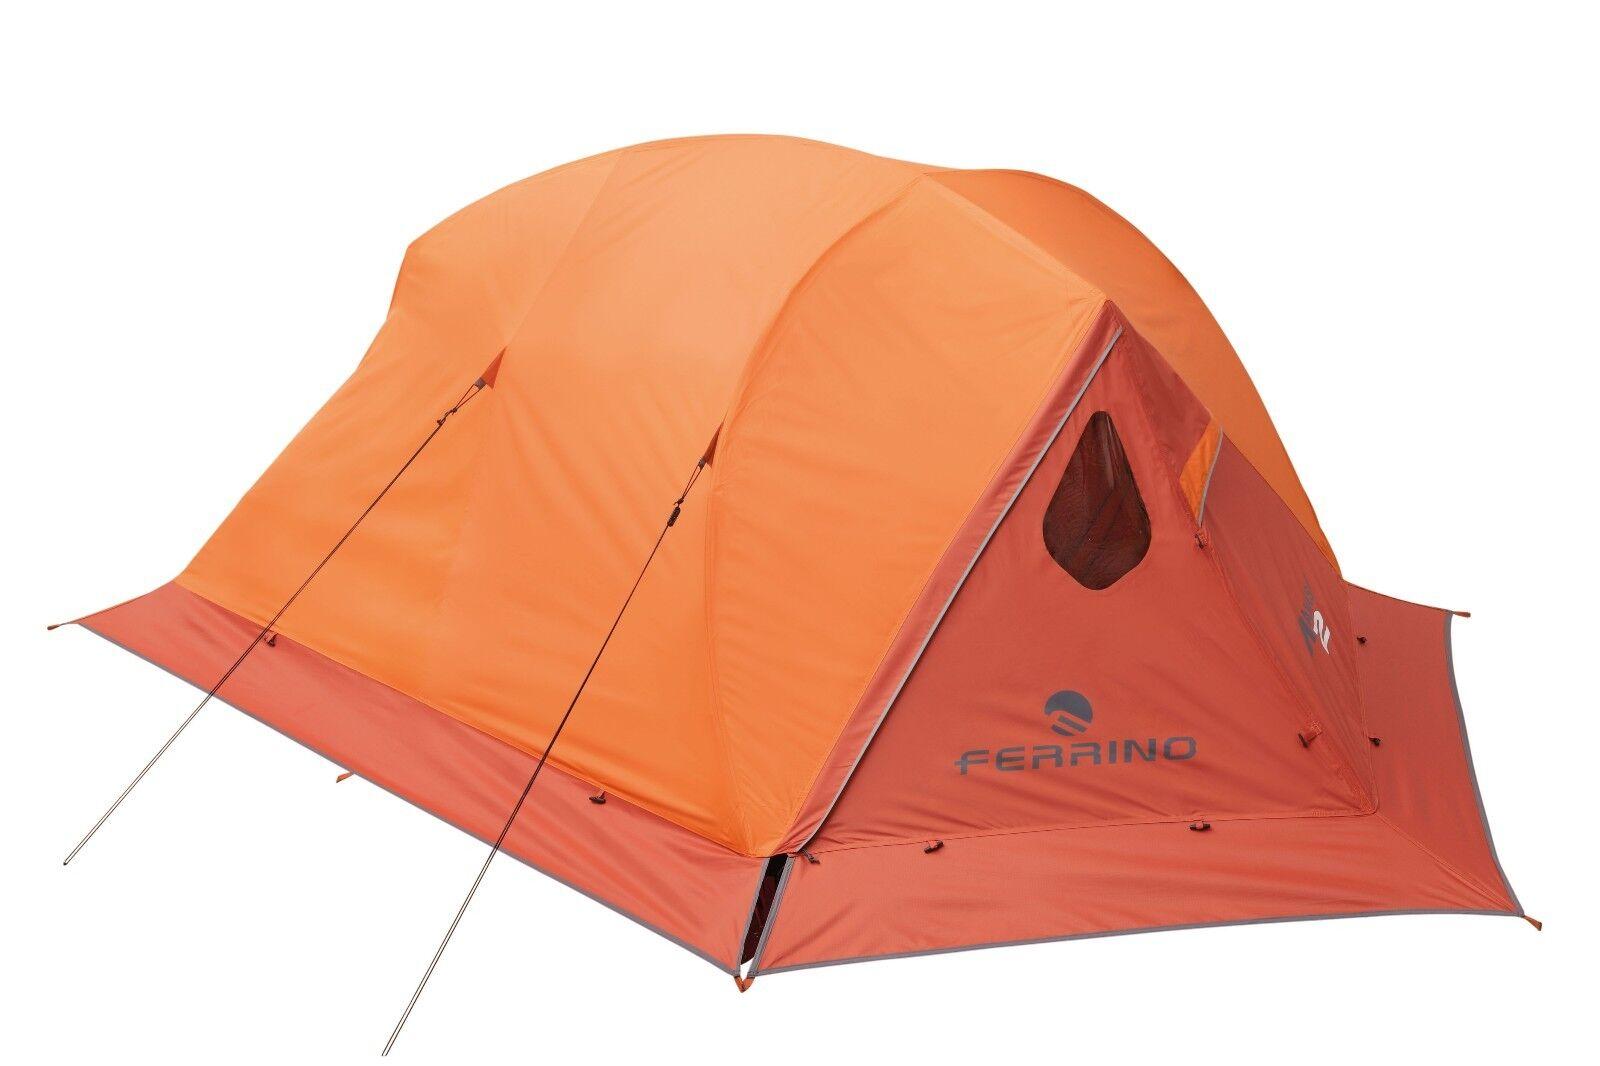 uomoaslu 2 tenda 4 stagioni seasons Ferrino mountain igloo tent lightweight lite